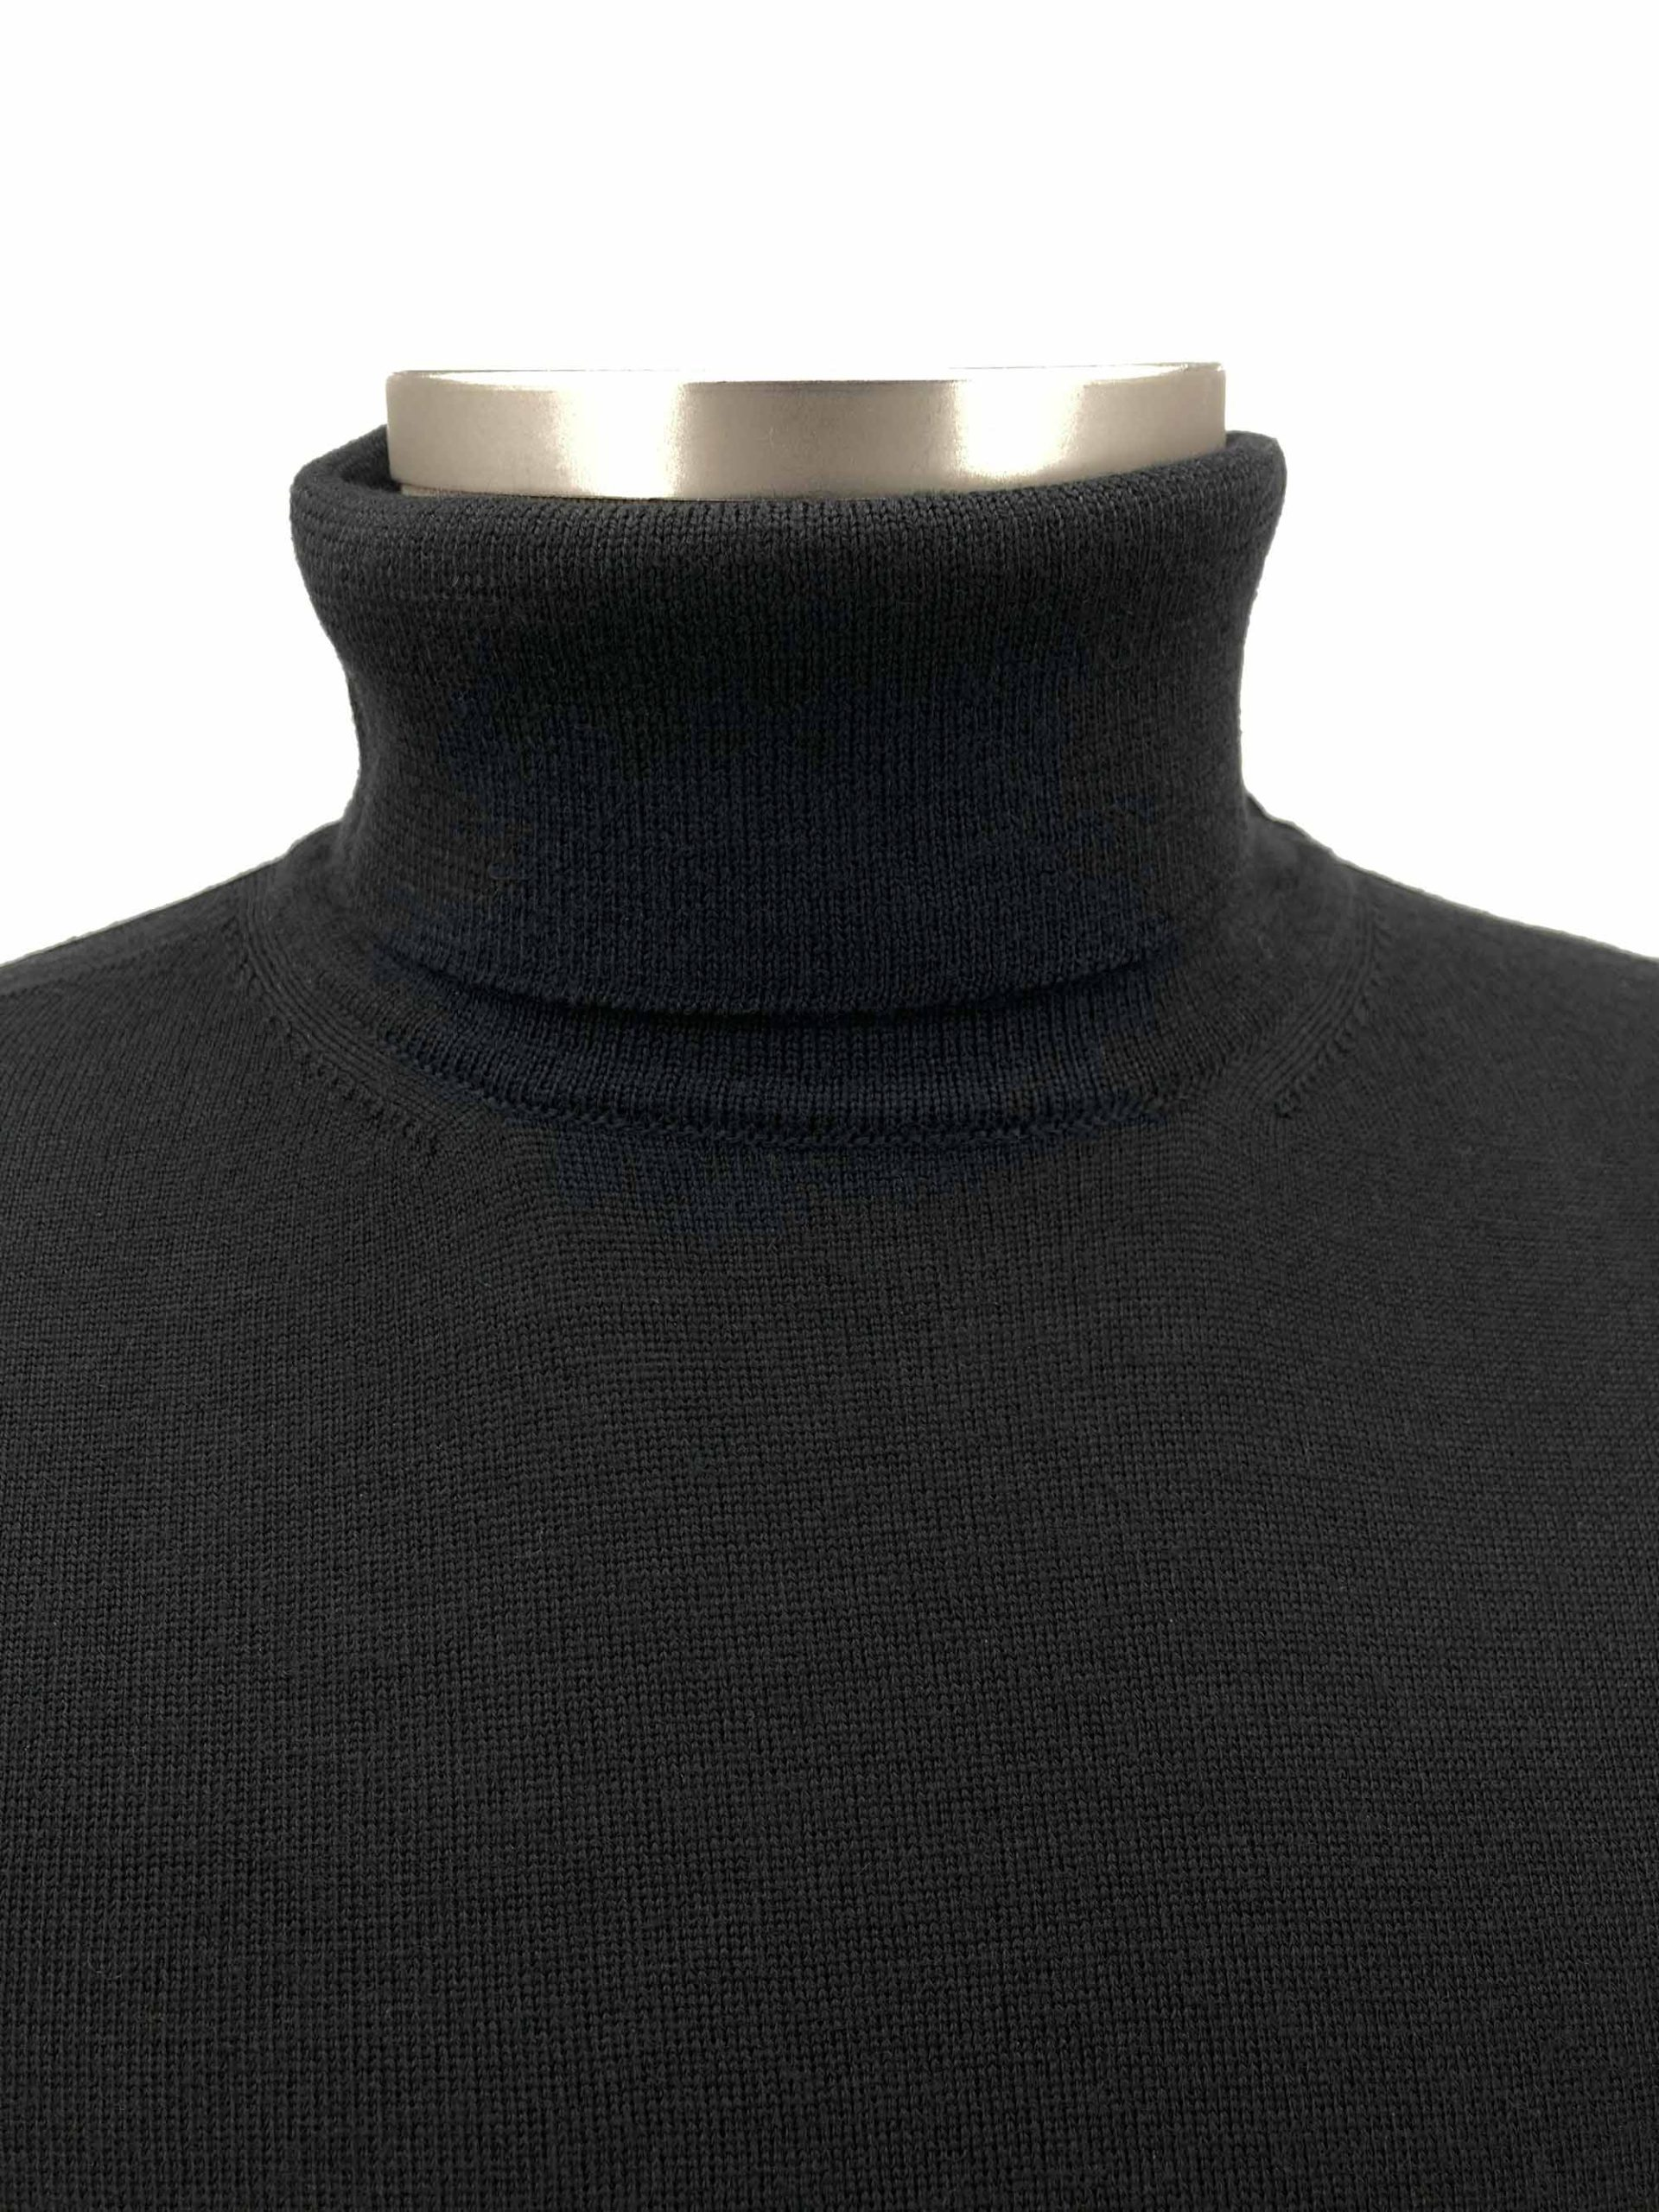 jersey buona fortuna comprar online jerseis italianos exlusivos negro cuello cisne shop